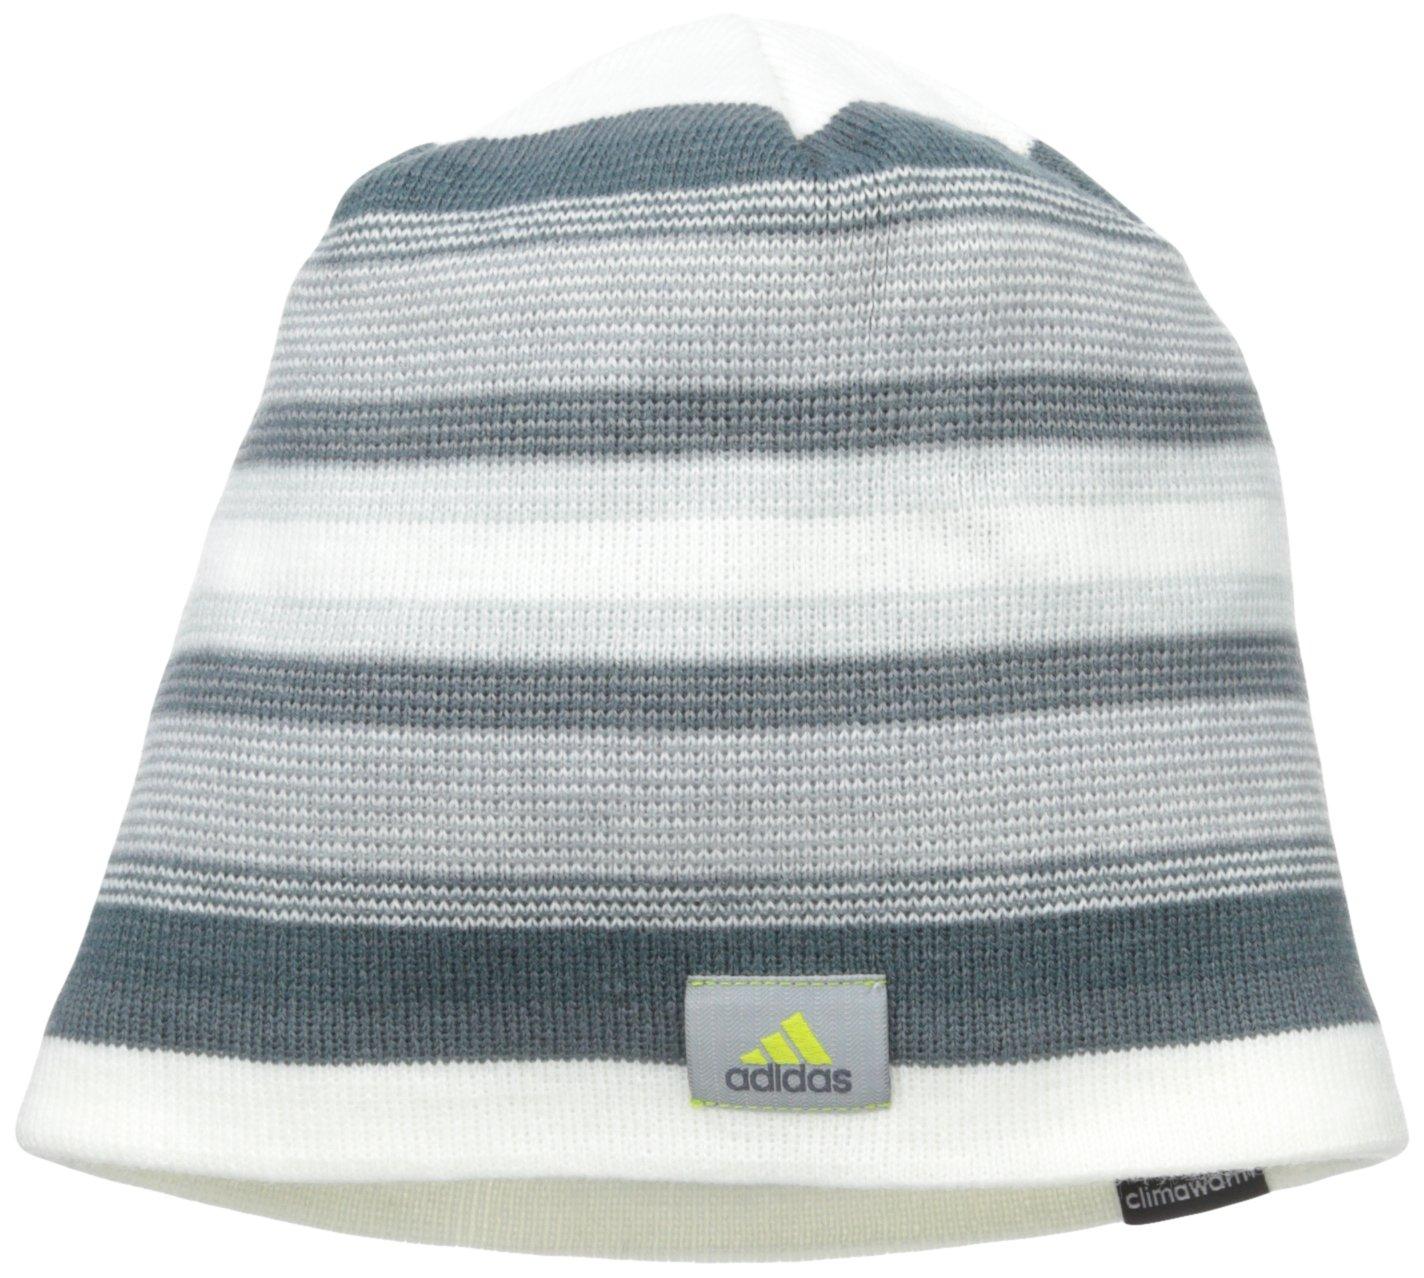 51f286b4 adidas Men's Keystone Beanie, One Size, Chalk White/Clear  Onix/Midnight/Solar Yellow: Amazon.in: Sports, Fitness & Outdoors